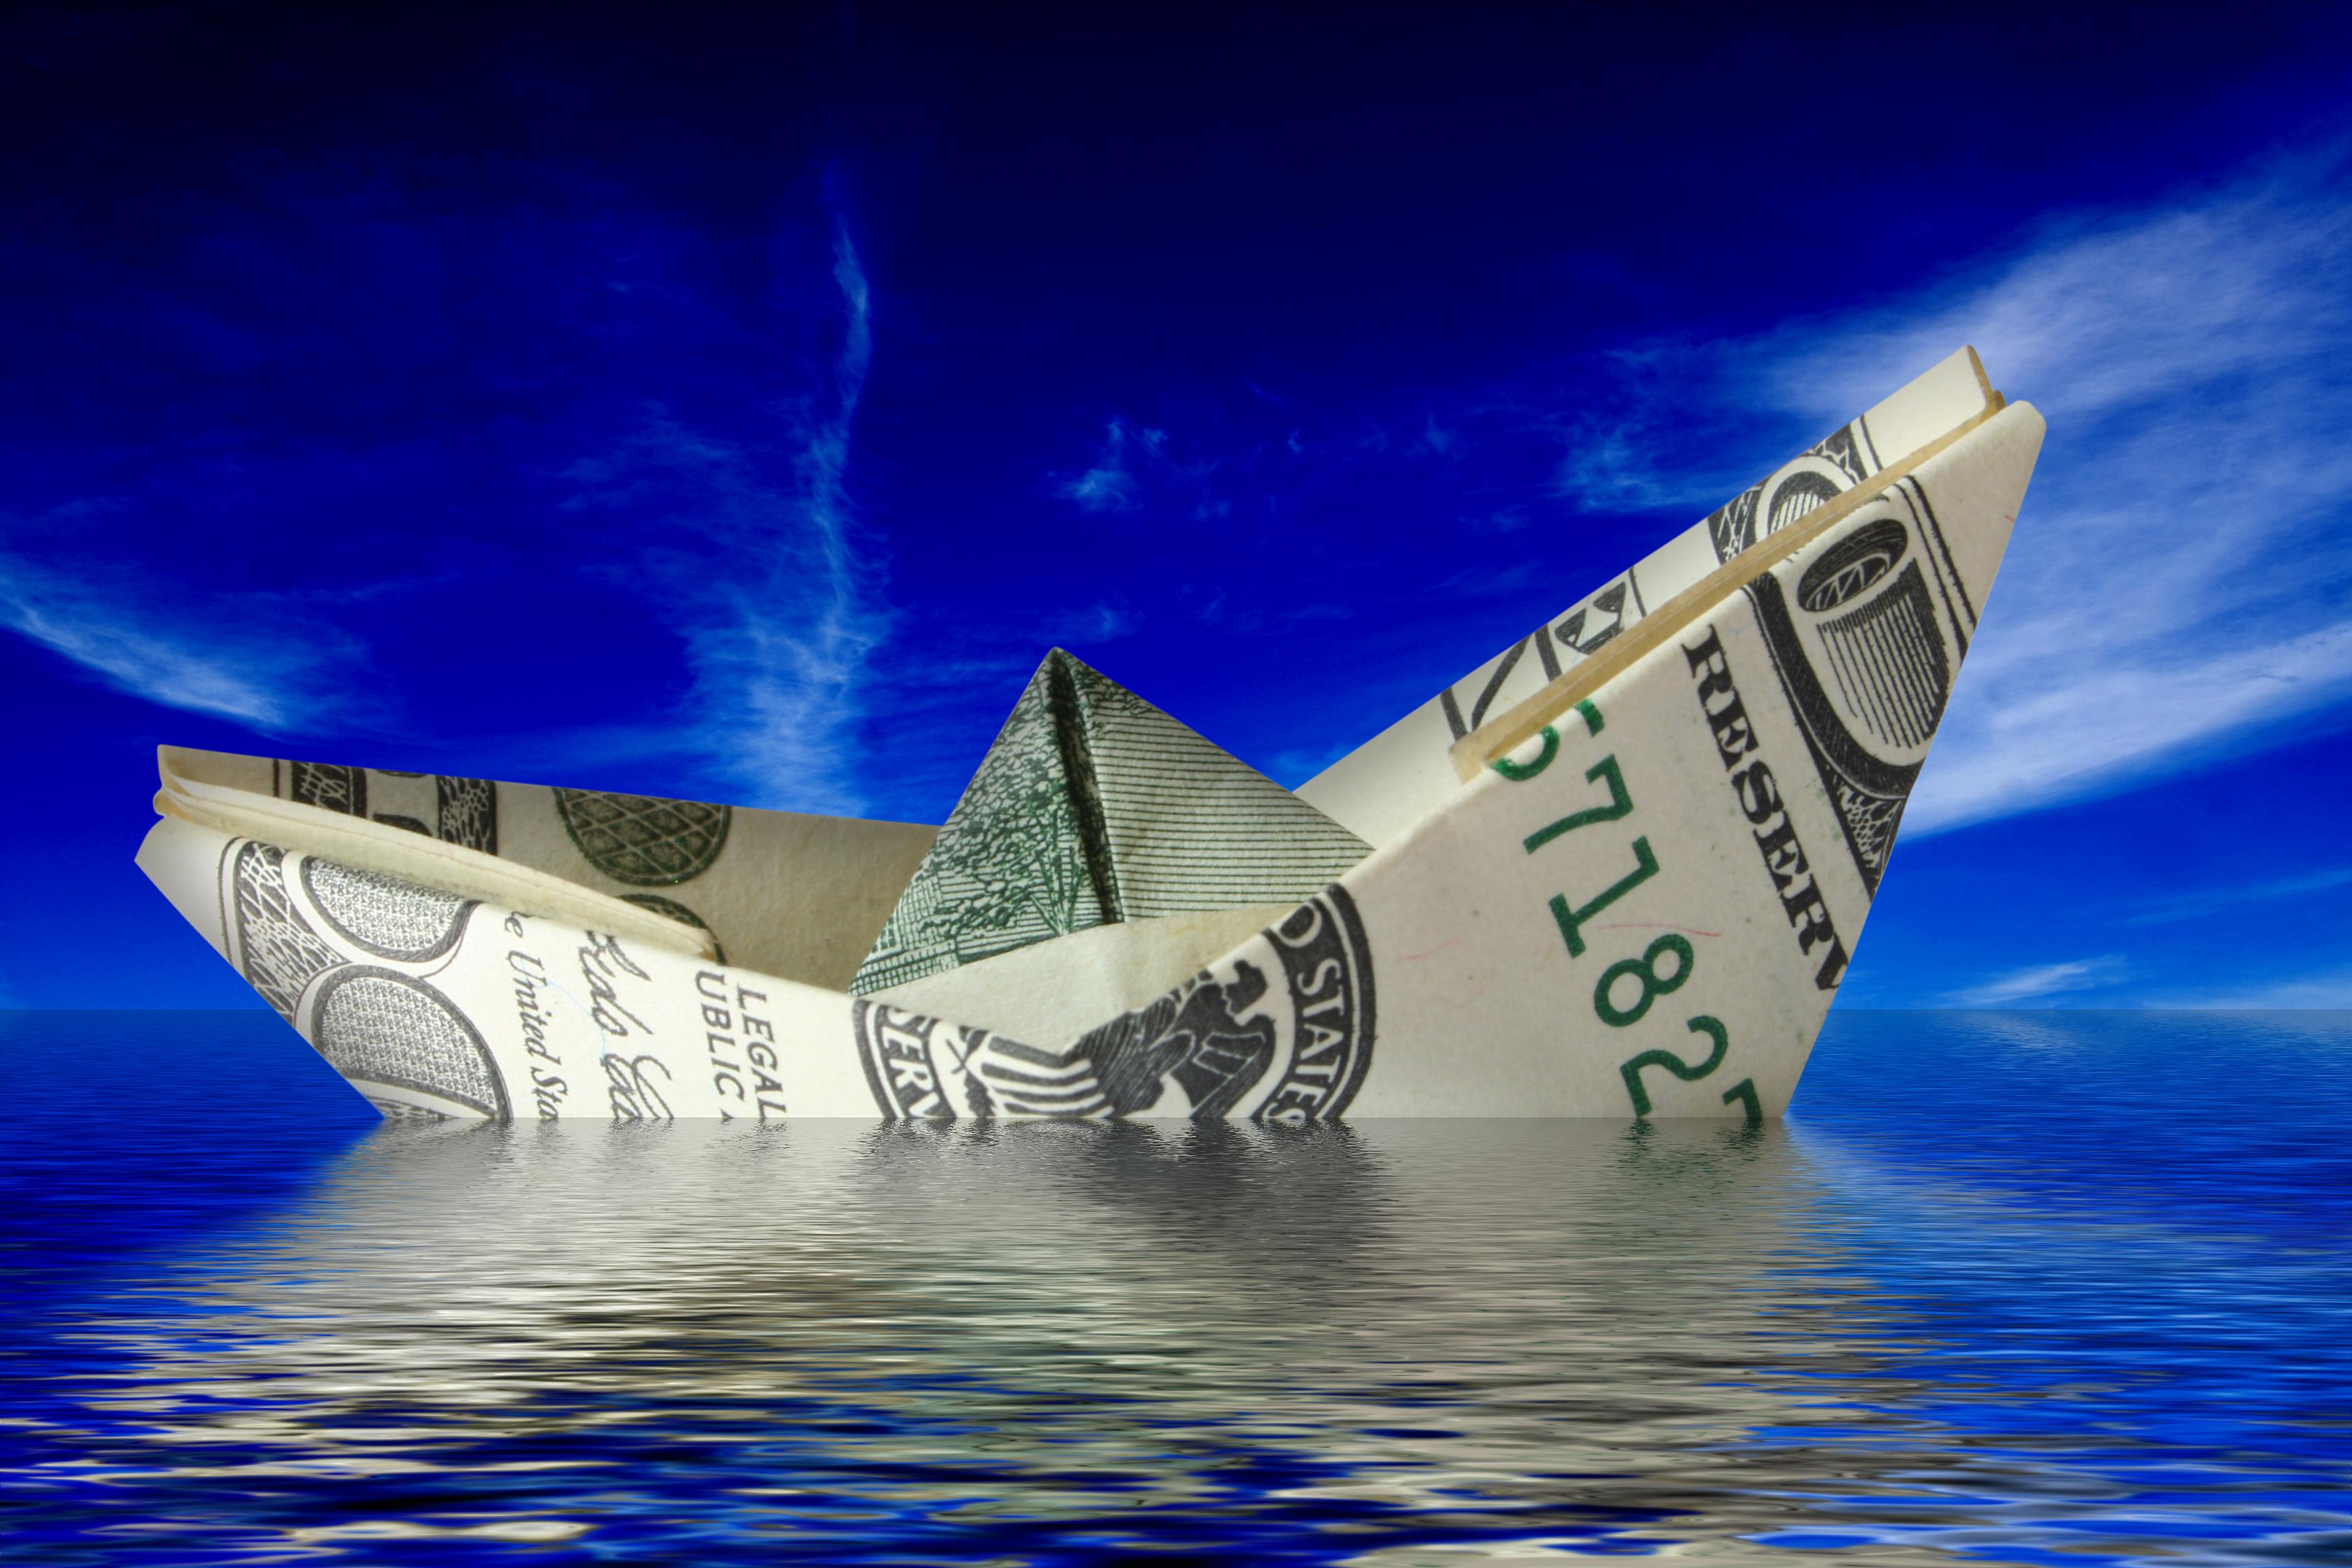 Sinking-Ship-l-Reverse-Mergers